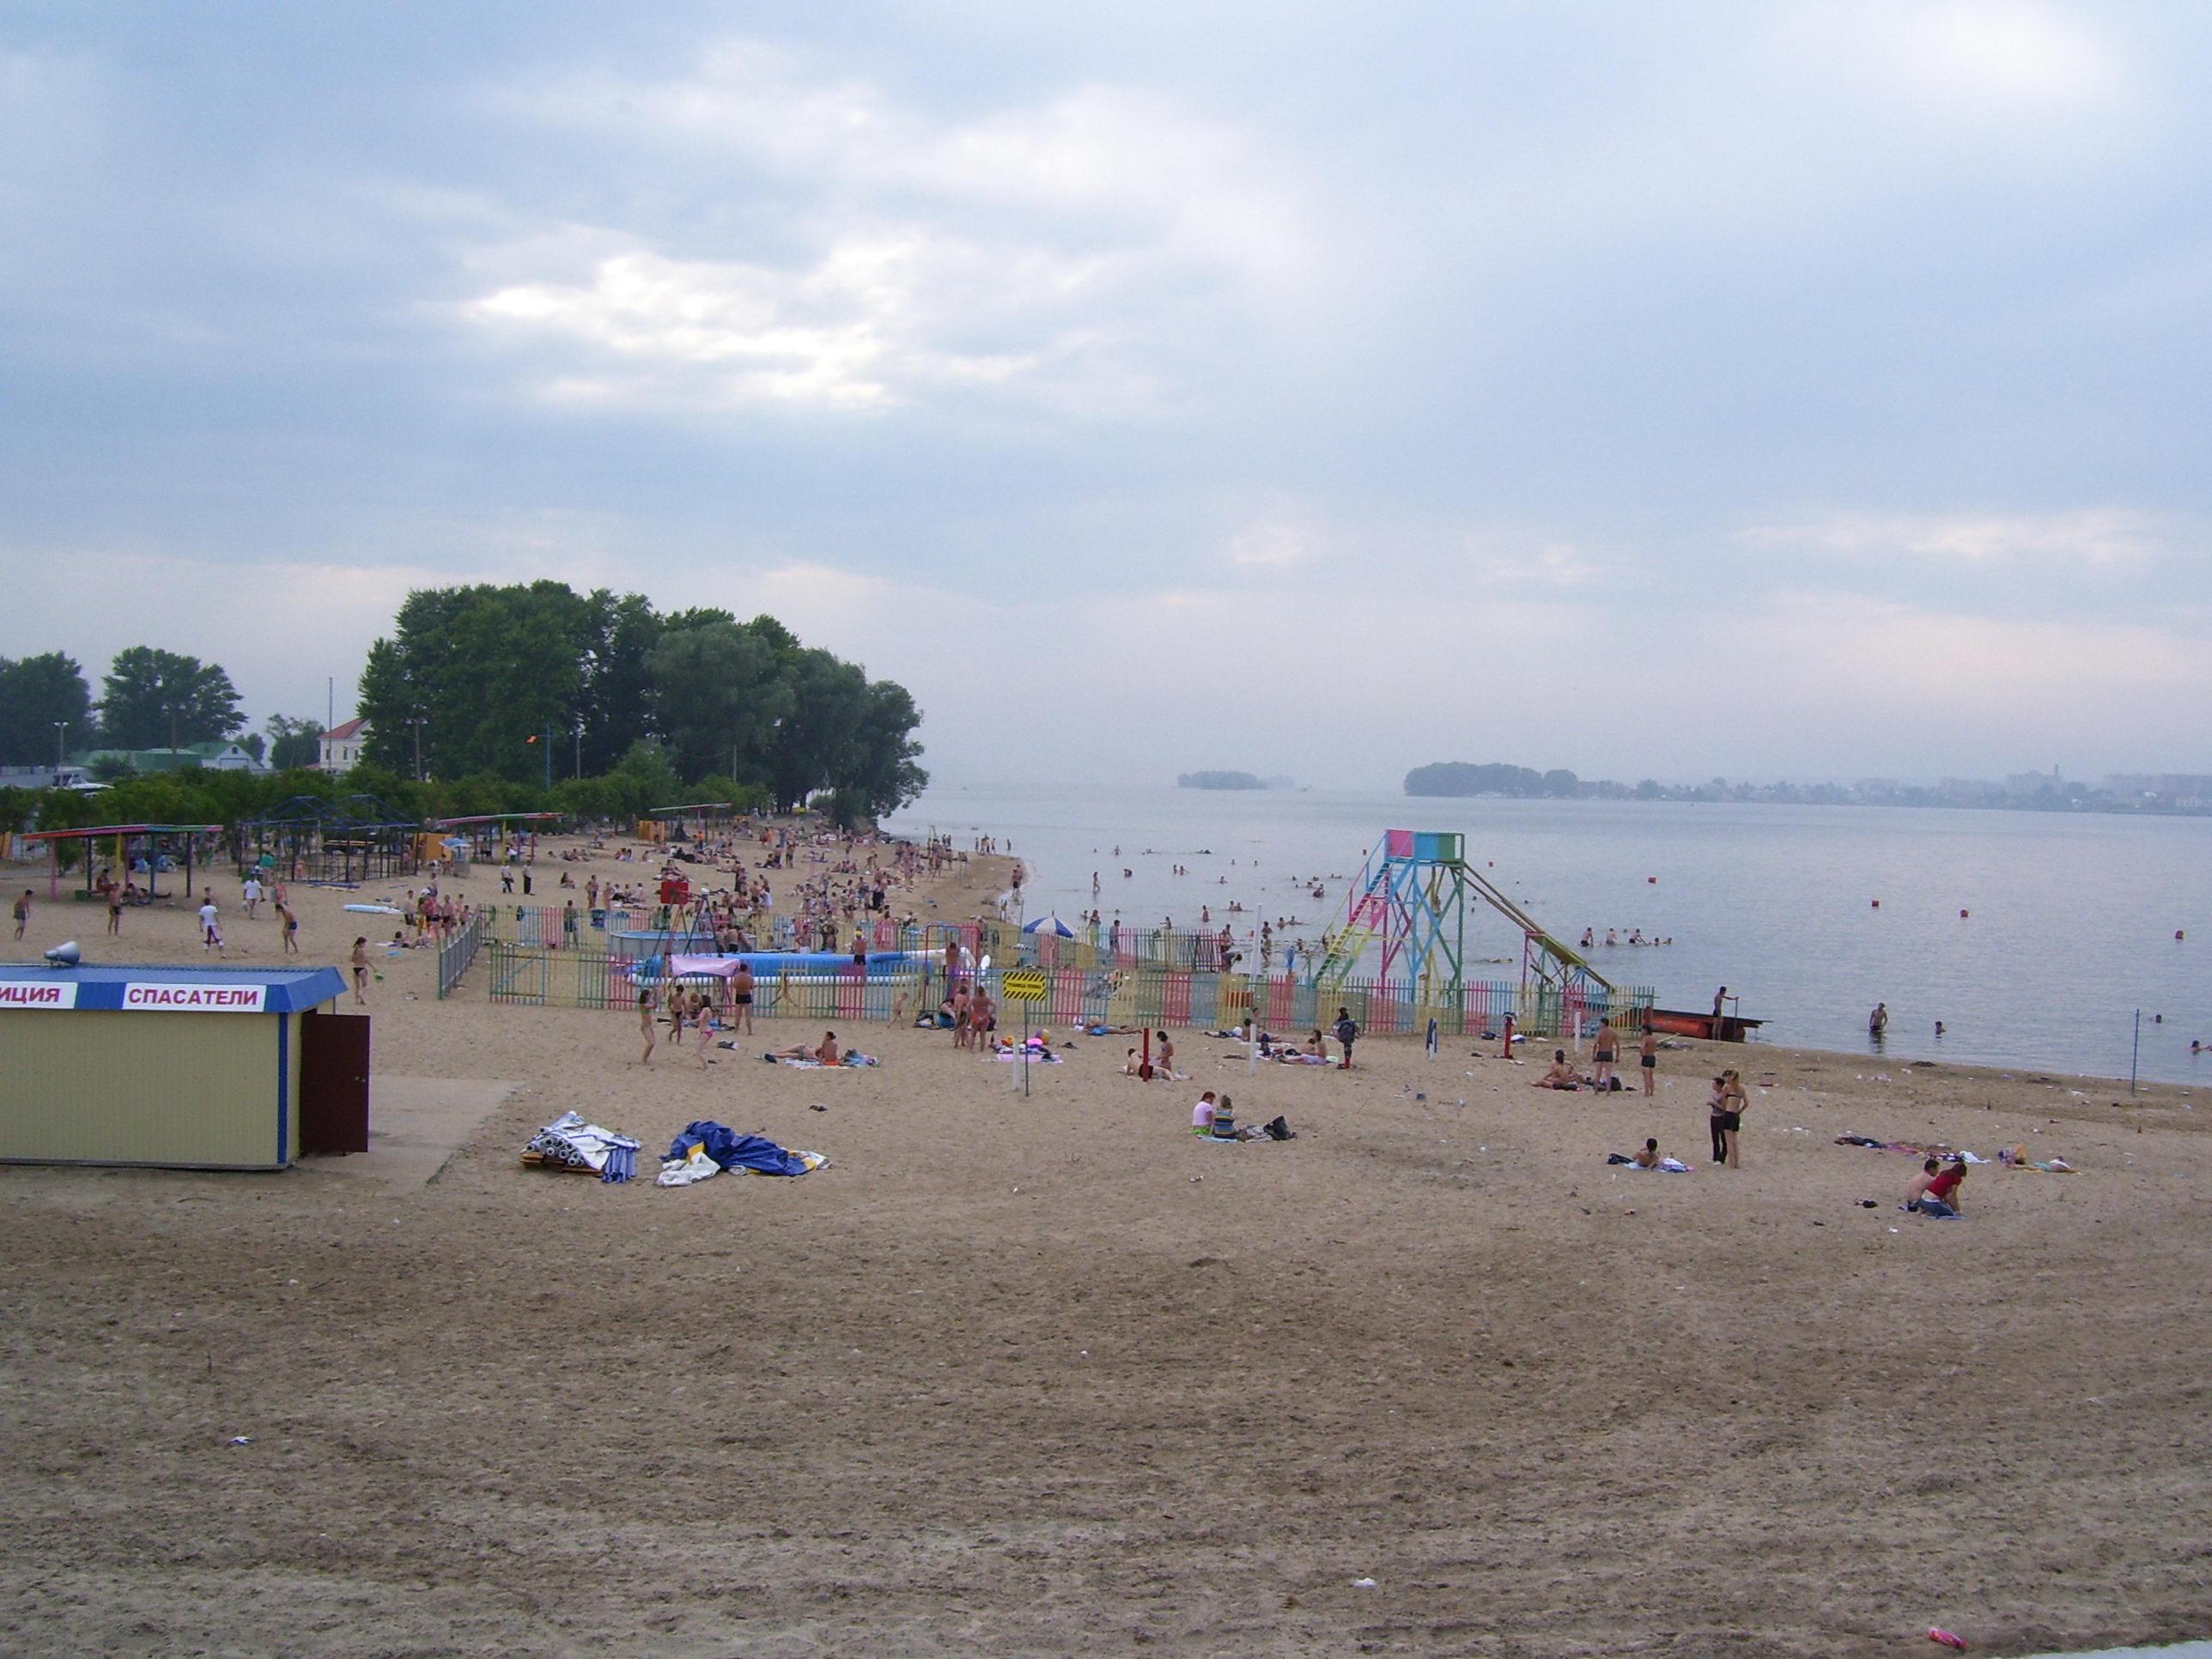 На береге «Локомотив» хотят обустроить вертолетную площадку